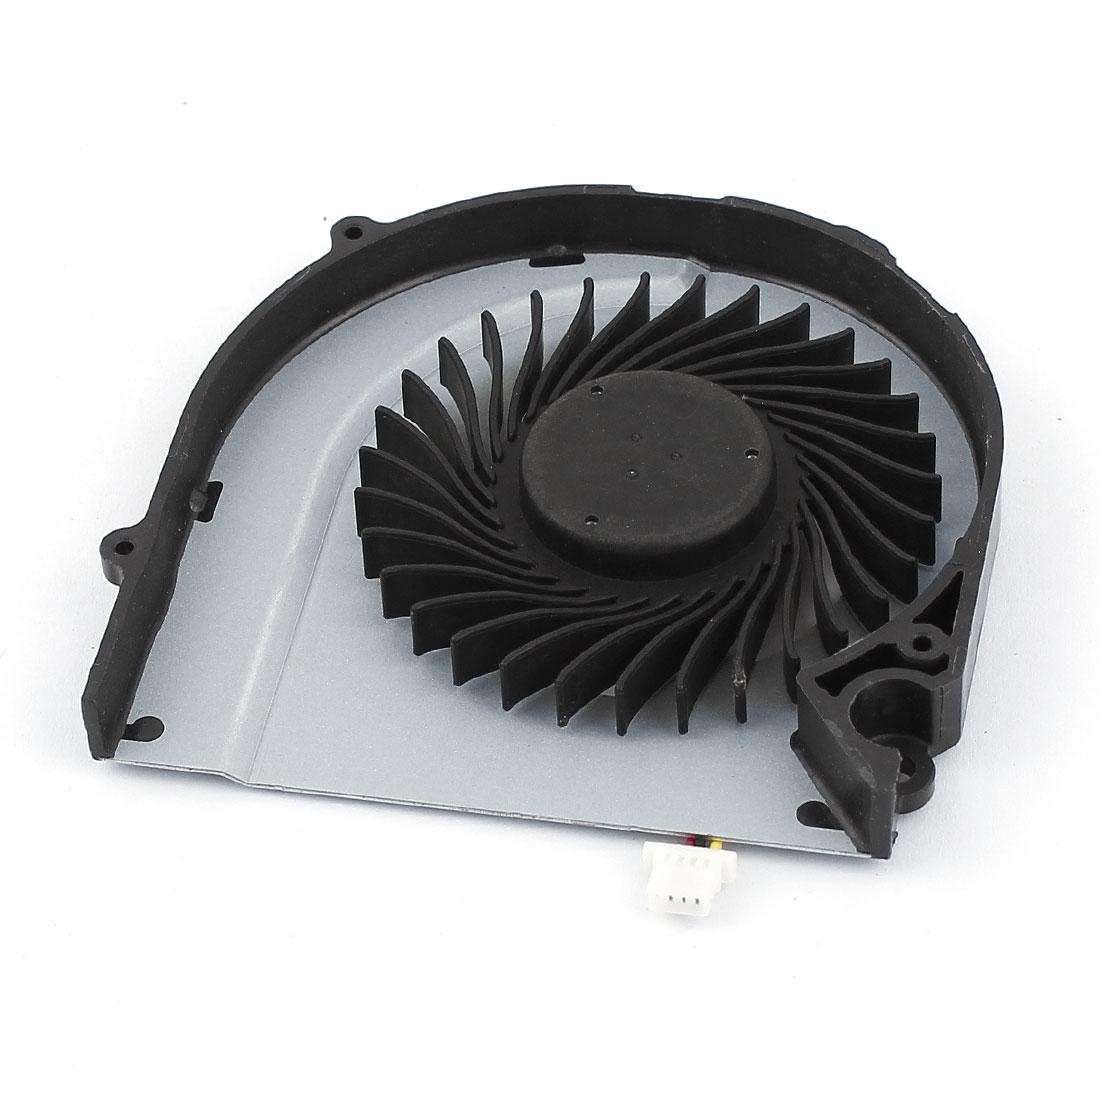 Notebook PC CPU Cooling Fan Cooler 3Pins DC 5V 0.5A for HP Pavilion DM4-3000